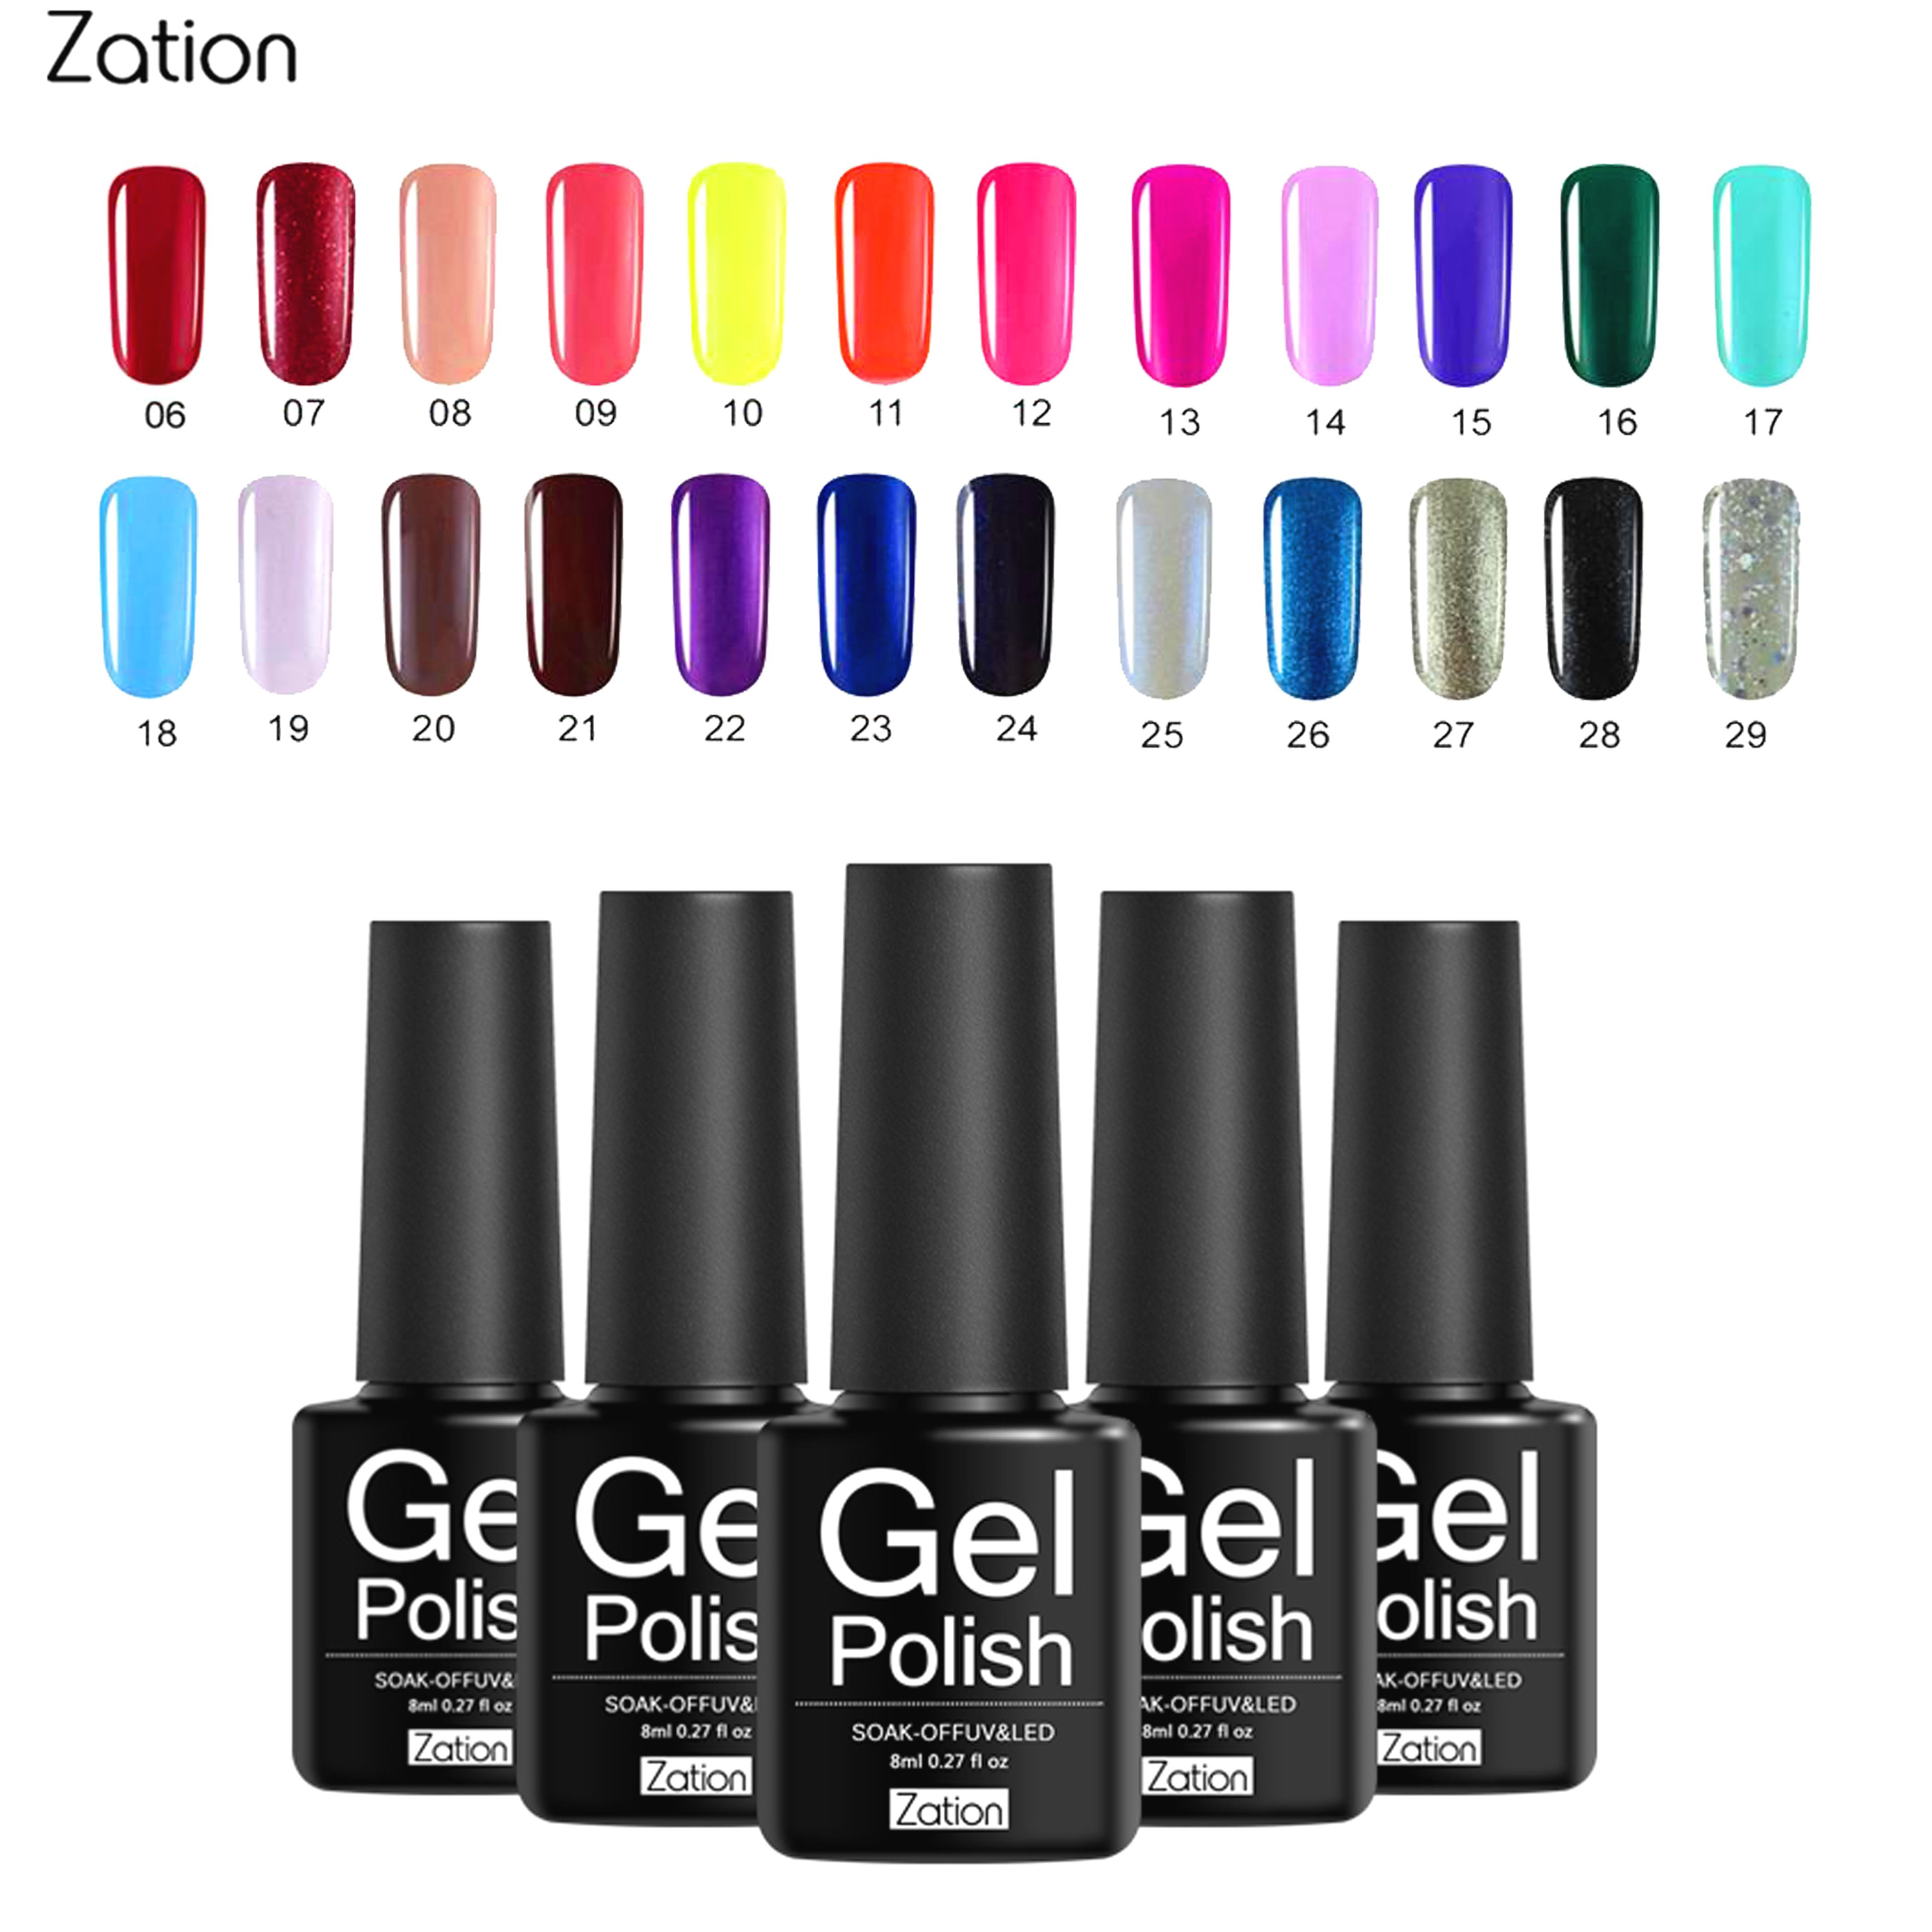 Zation Pure Colors Uv Nail Gel Semi Permanent 8ml Uv Gel Nail Polish Hybrid Primer Lak Soak Off Gel Varnish Nail Art Design Nail Gel Aliexpress